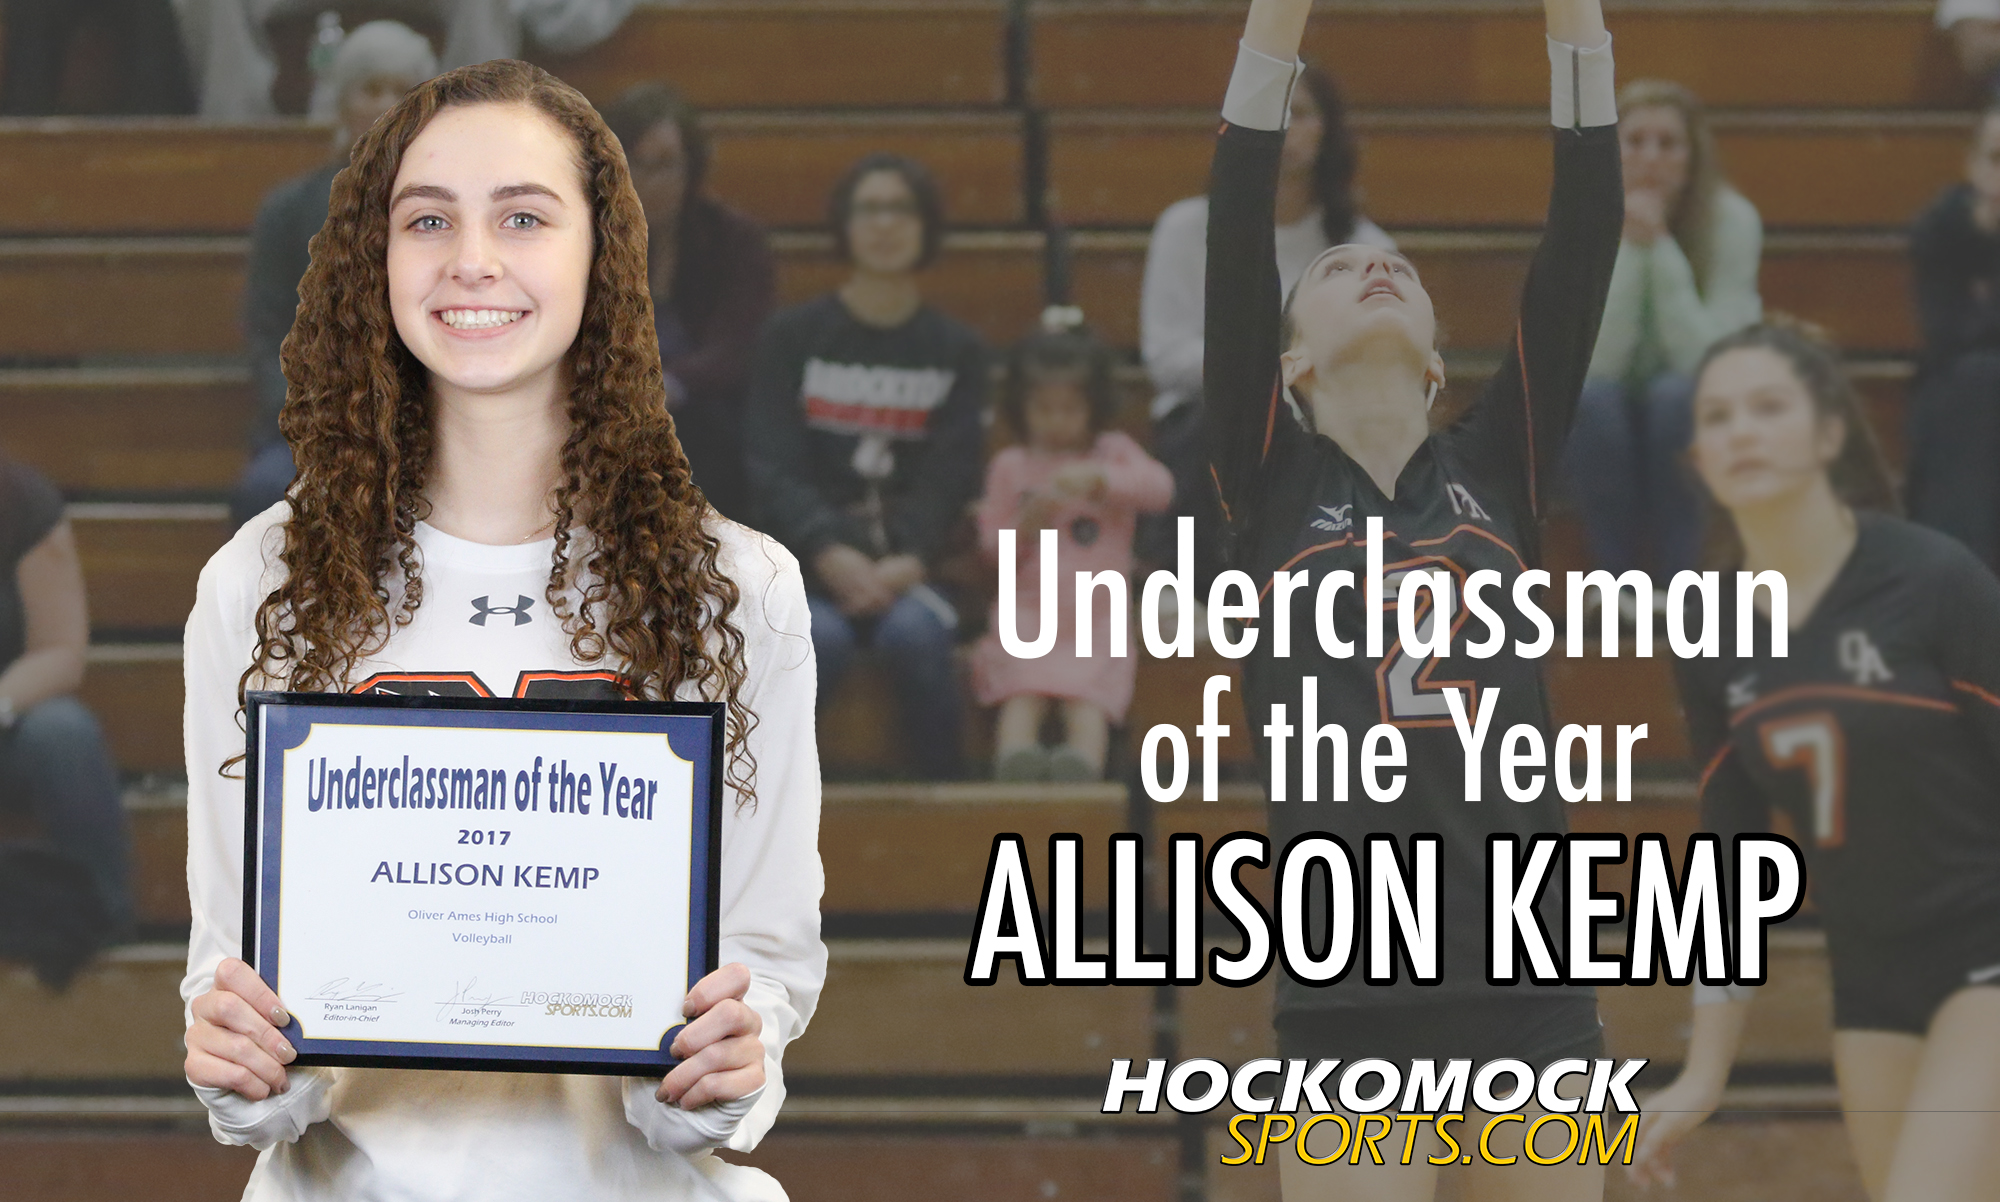 Allison Kemp